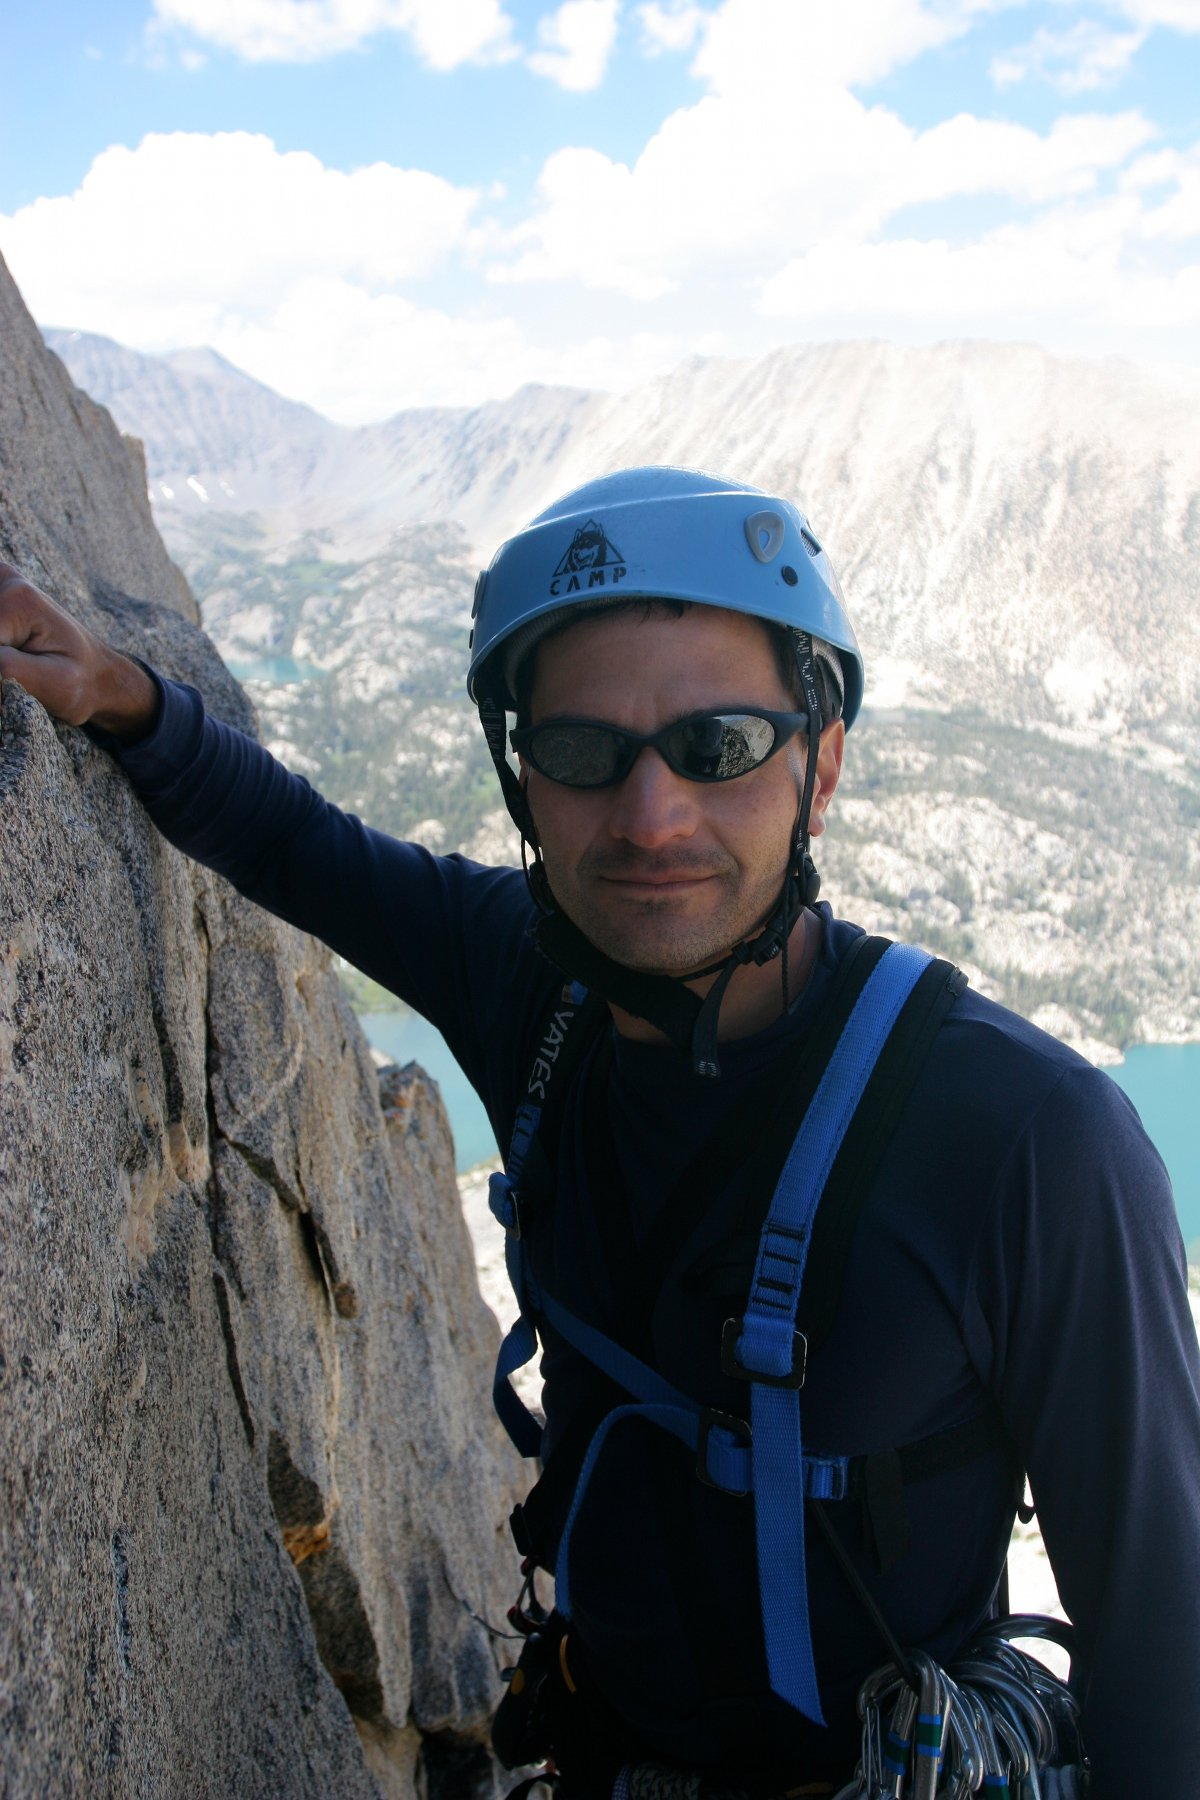 Michael Ybarra on Temple Crag (photo: Misha Logvinov)